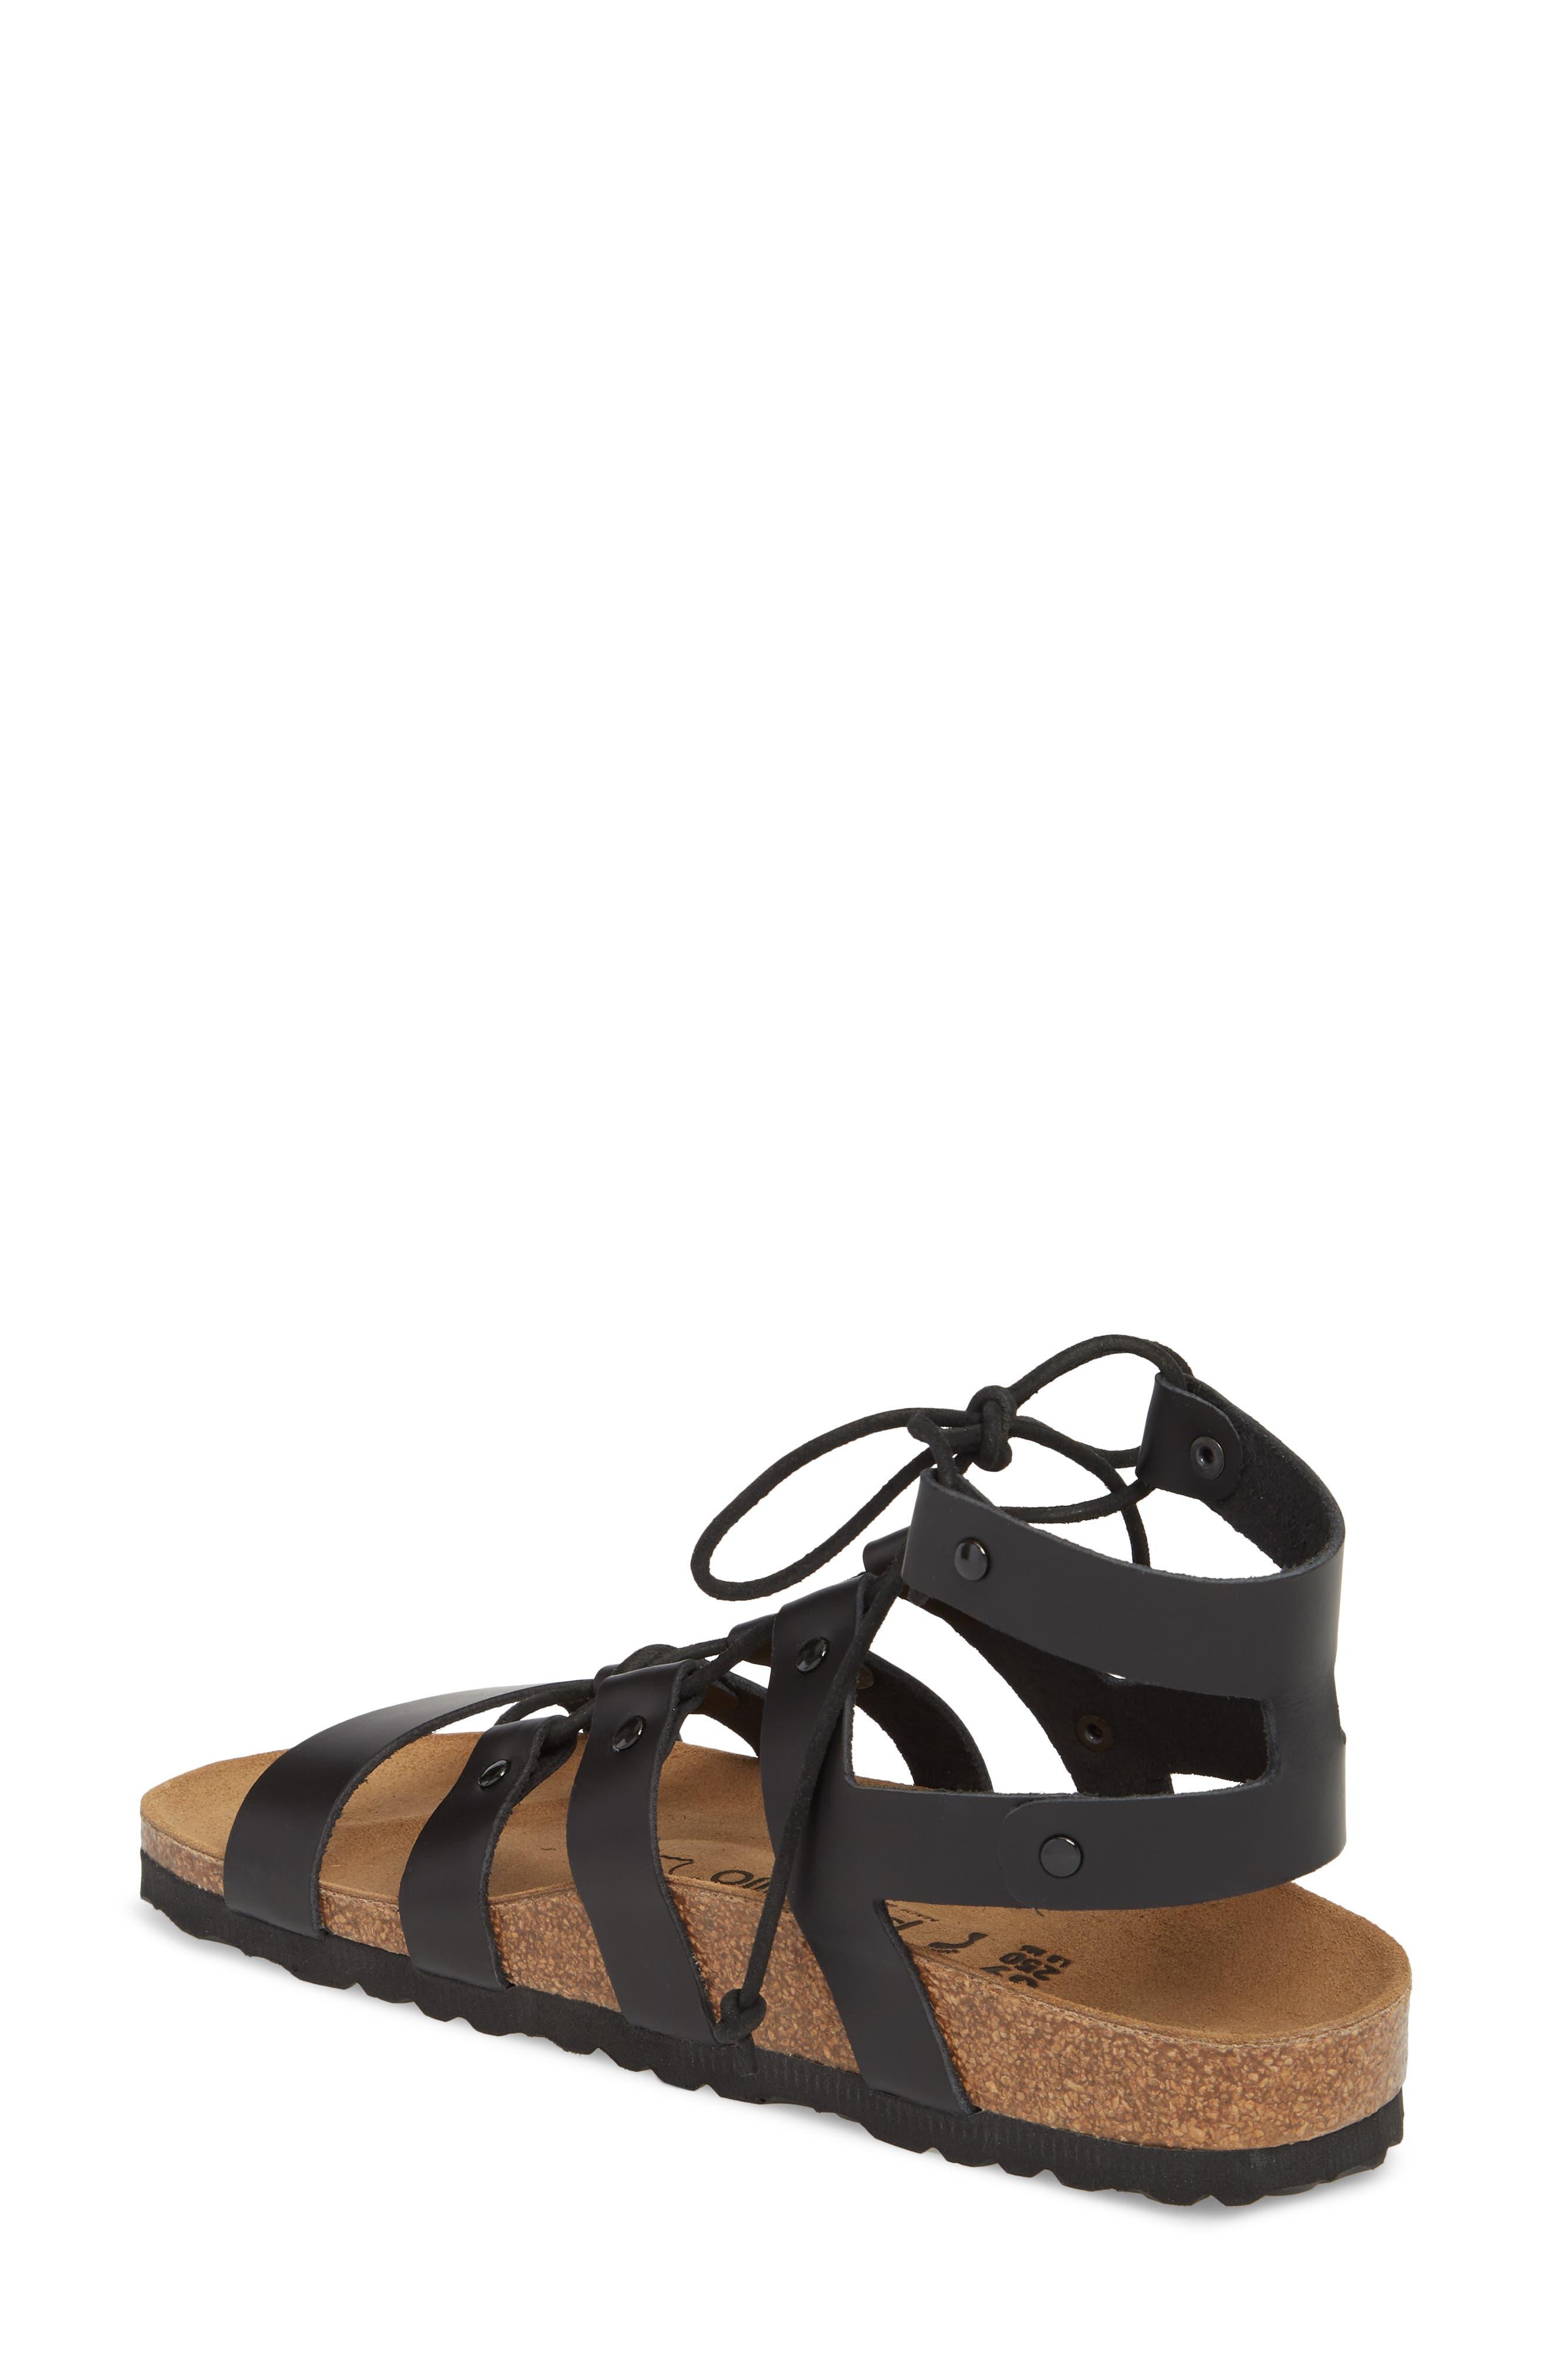 Papillio by Birkenstock Cleo Gladiator Sandal,                             Alternate thumbnail 2, color,                             001